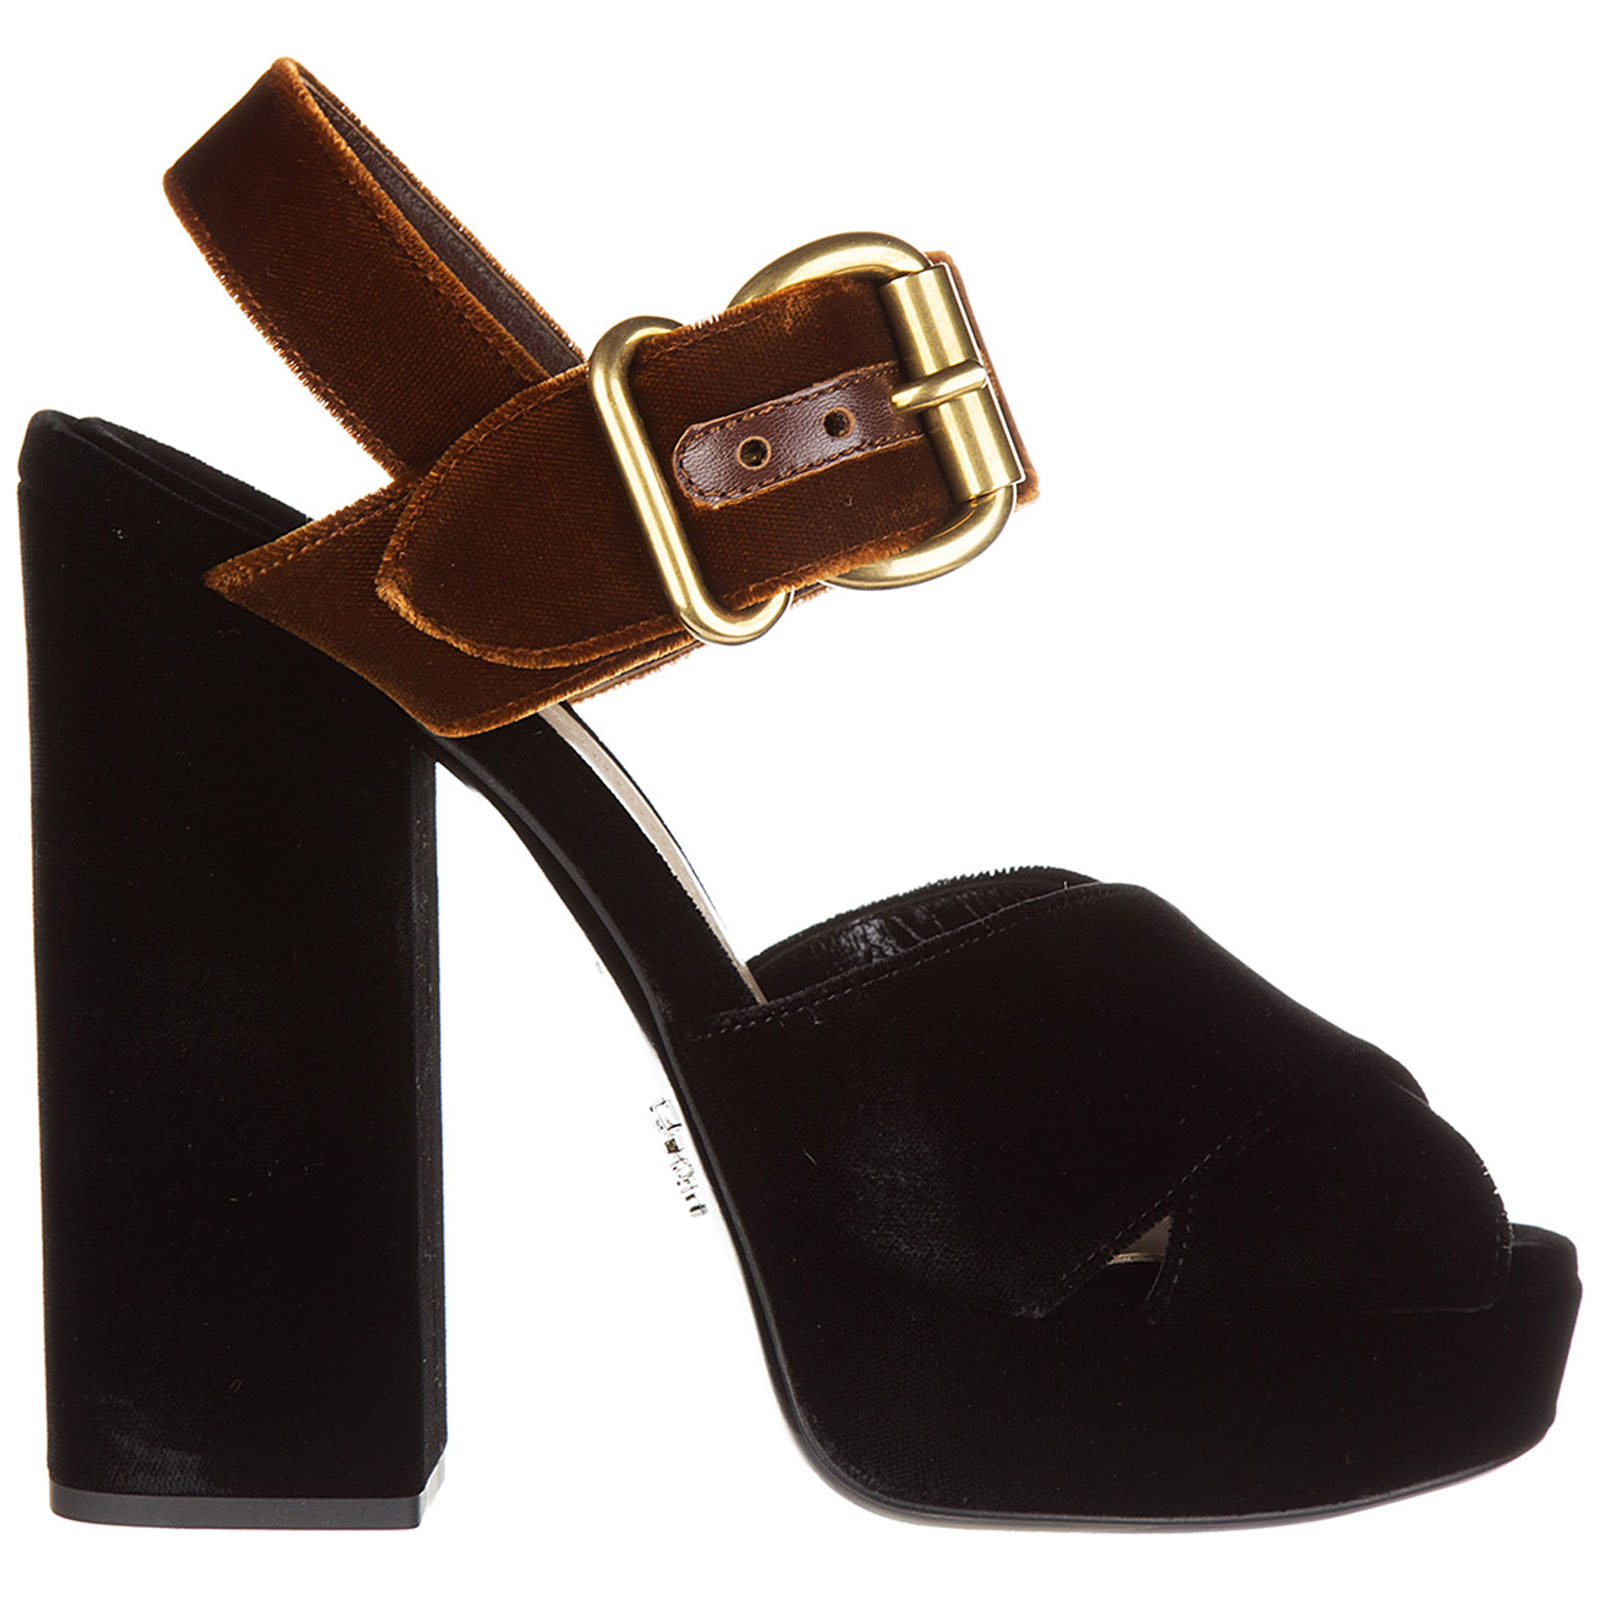 cba81c2a072a Sandals Prada 1XP873 866 F034S nero + tabacco